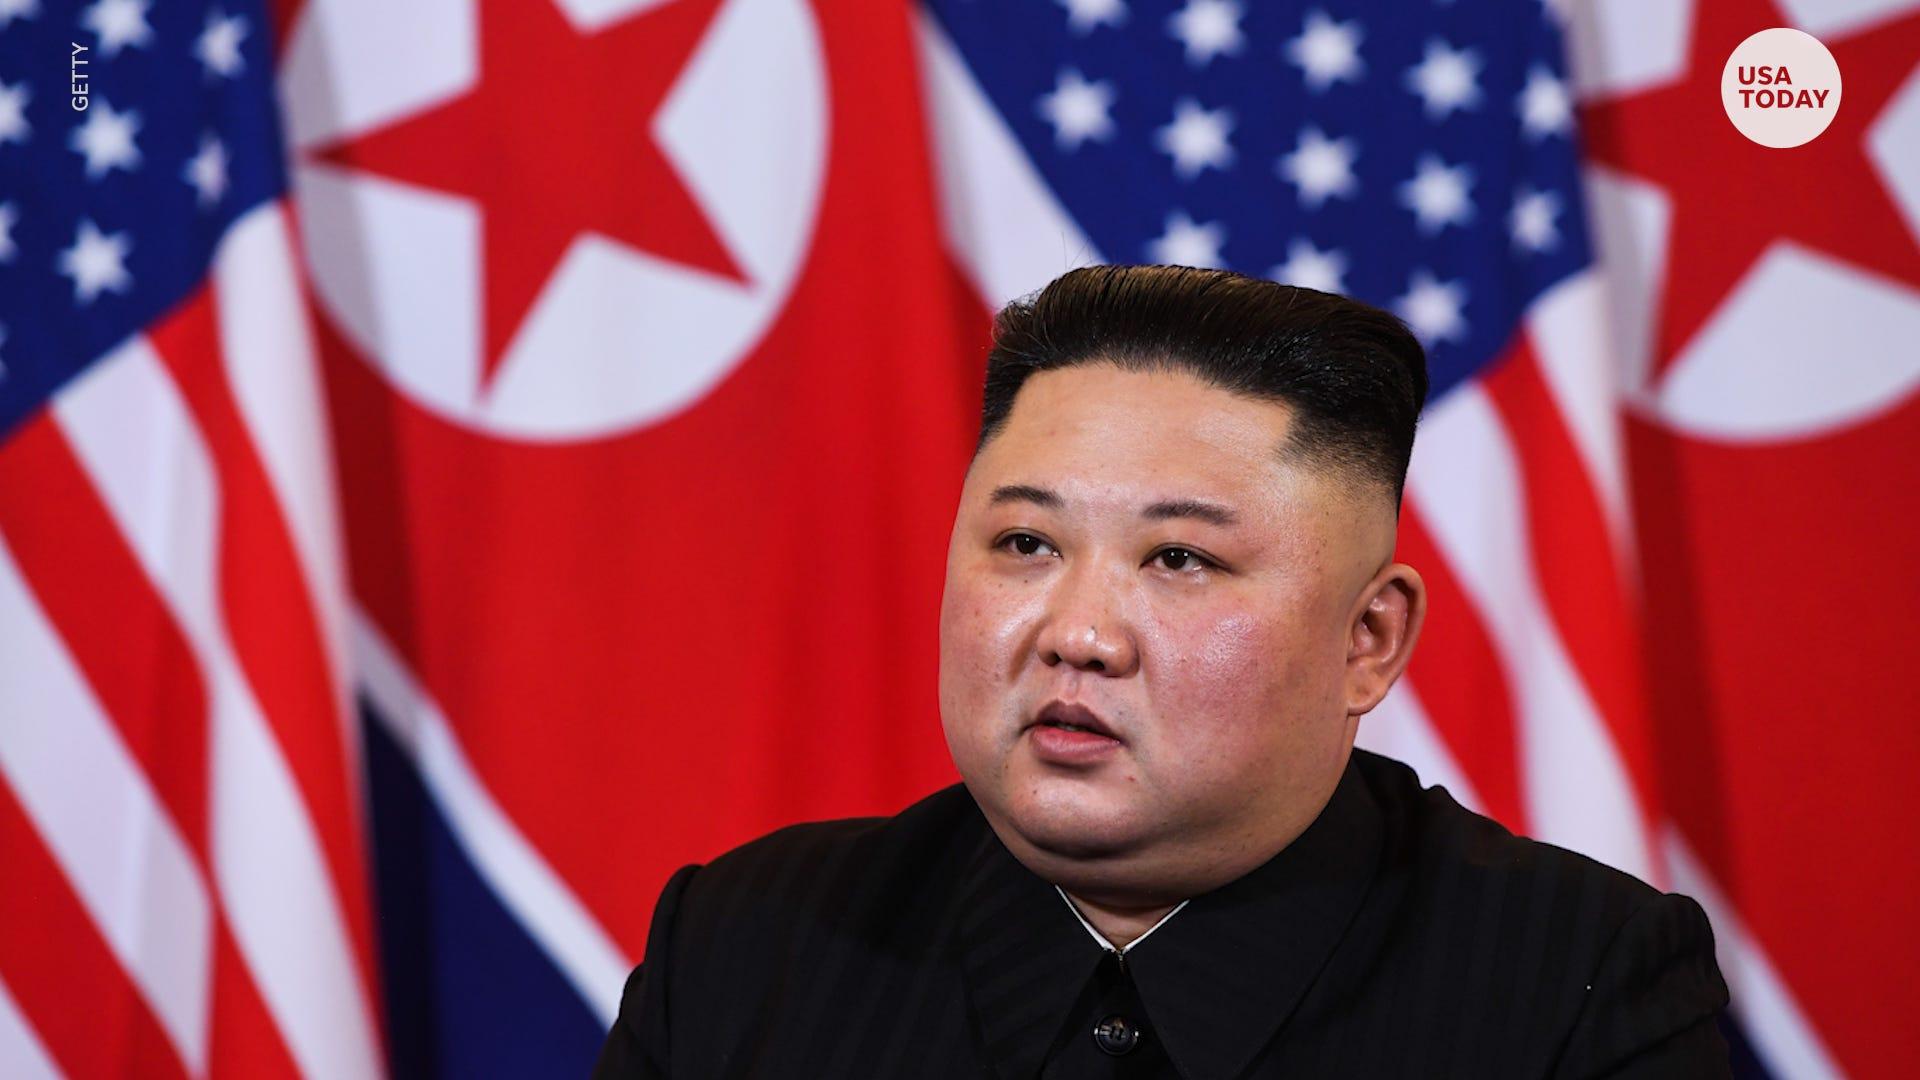 South Korea: No reason to think Kim Jong Un gravely ill despite U.S. media report